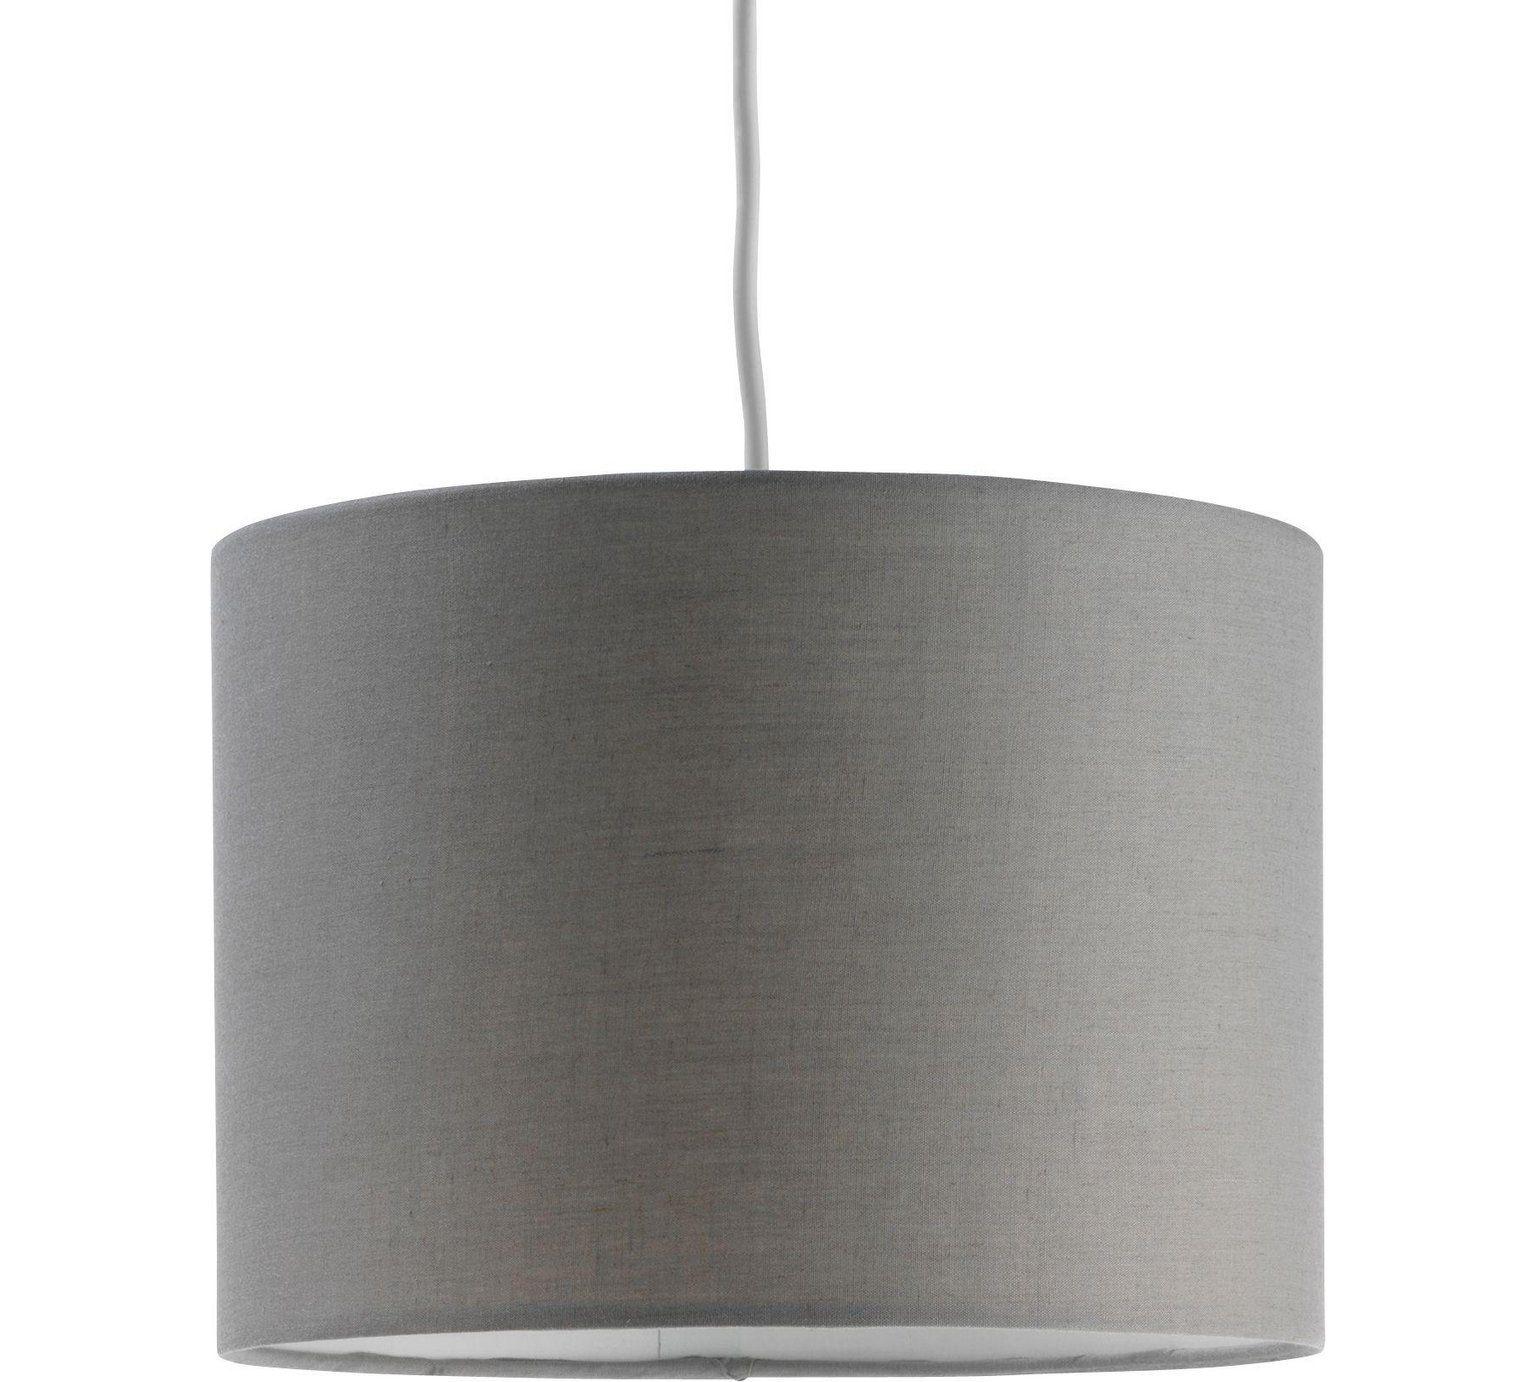 Colourmatch Fabric Light Shade Flint Grey At Argos Co Uk Visit